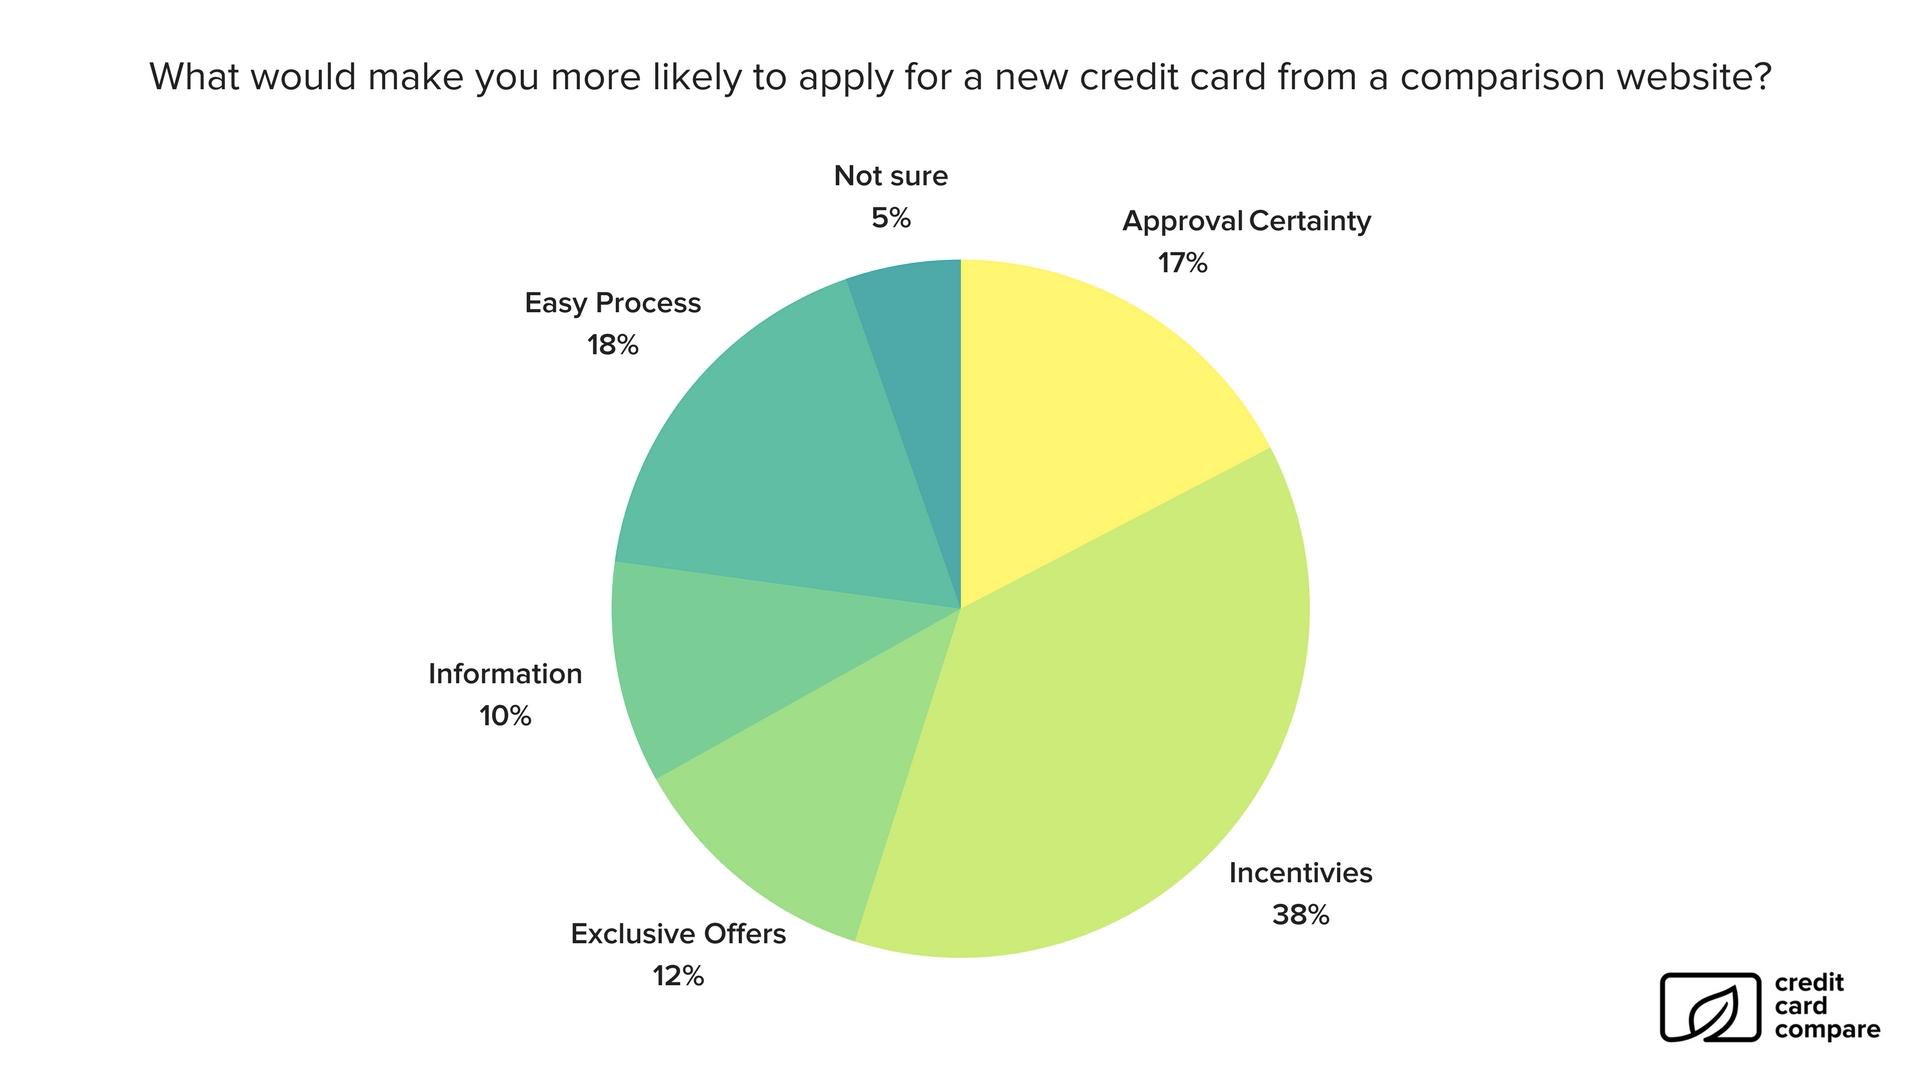 Survey response 4